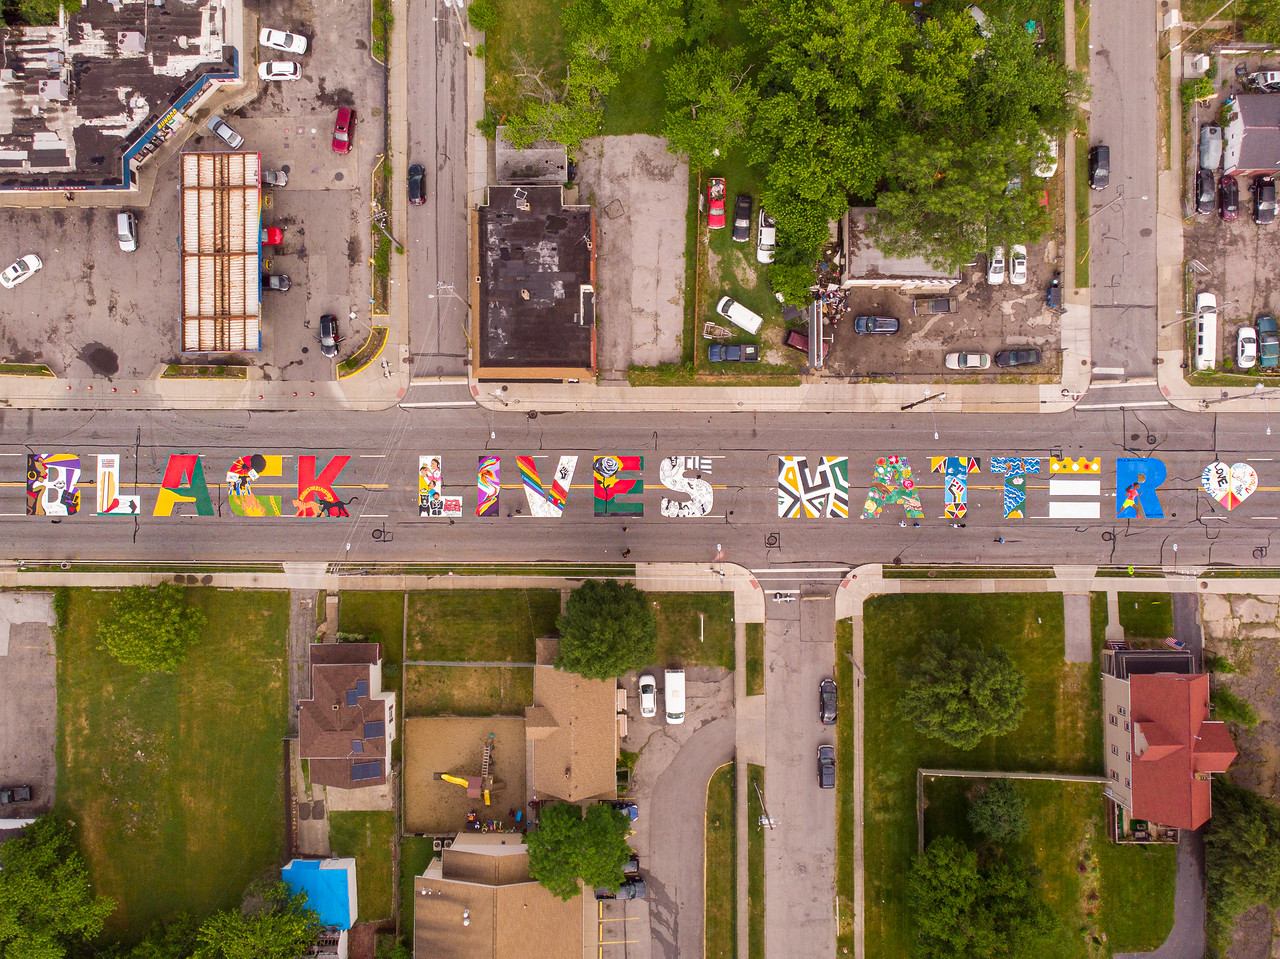 Cleveland Black Lives Matter street mural